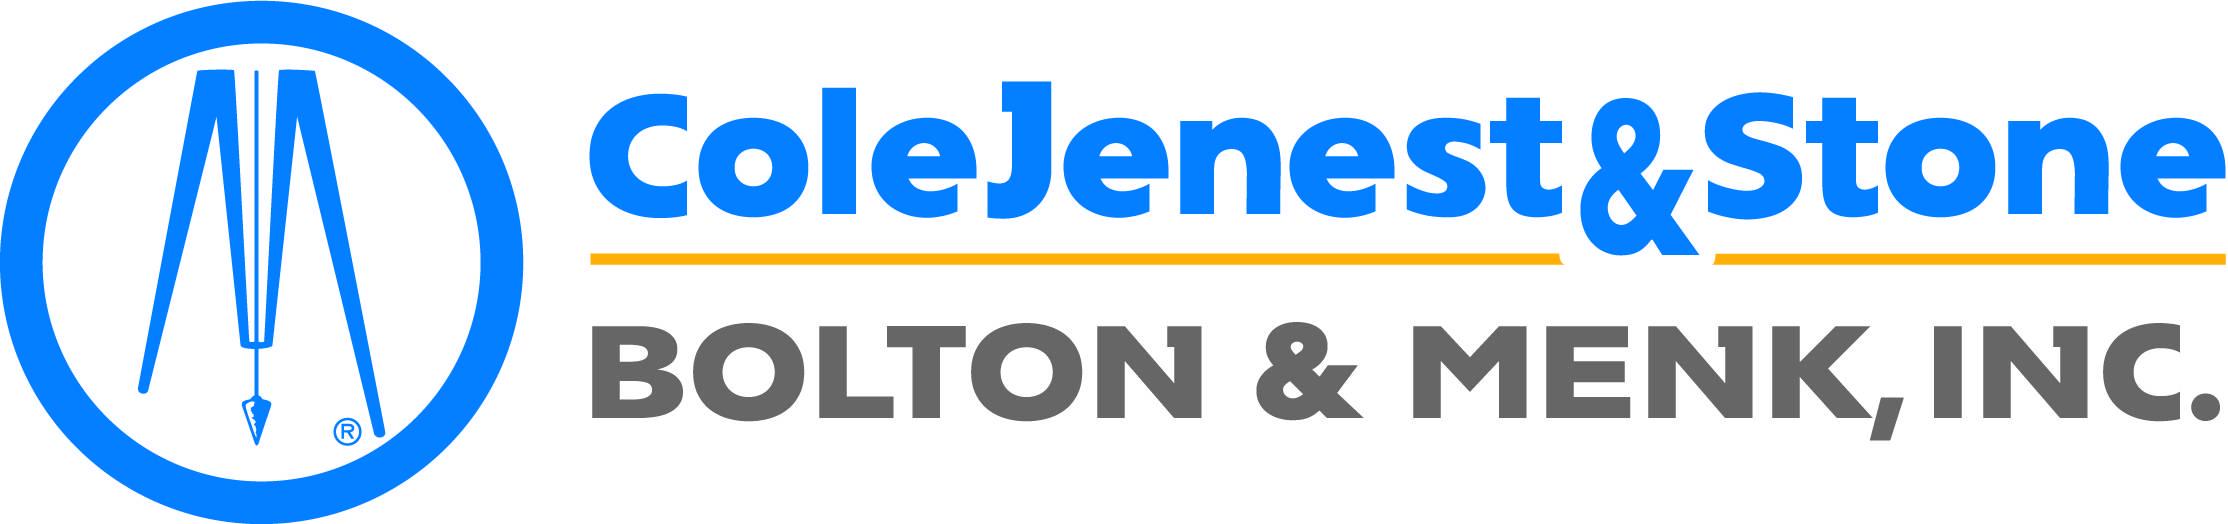 ColeJenest & Stone of Charlotte, NC Joins Bolton & Menk